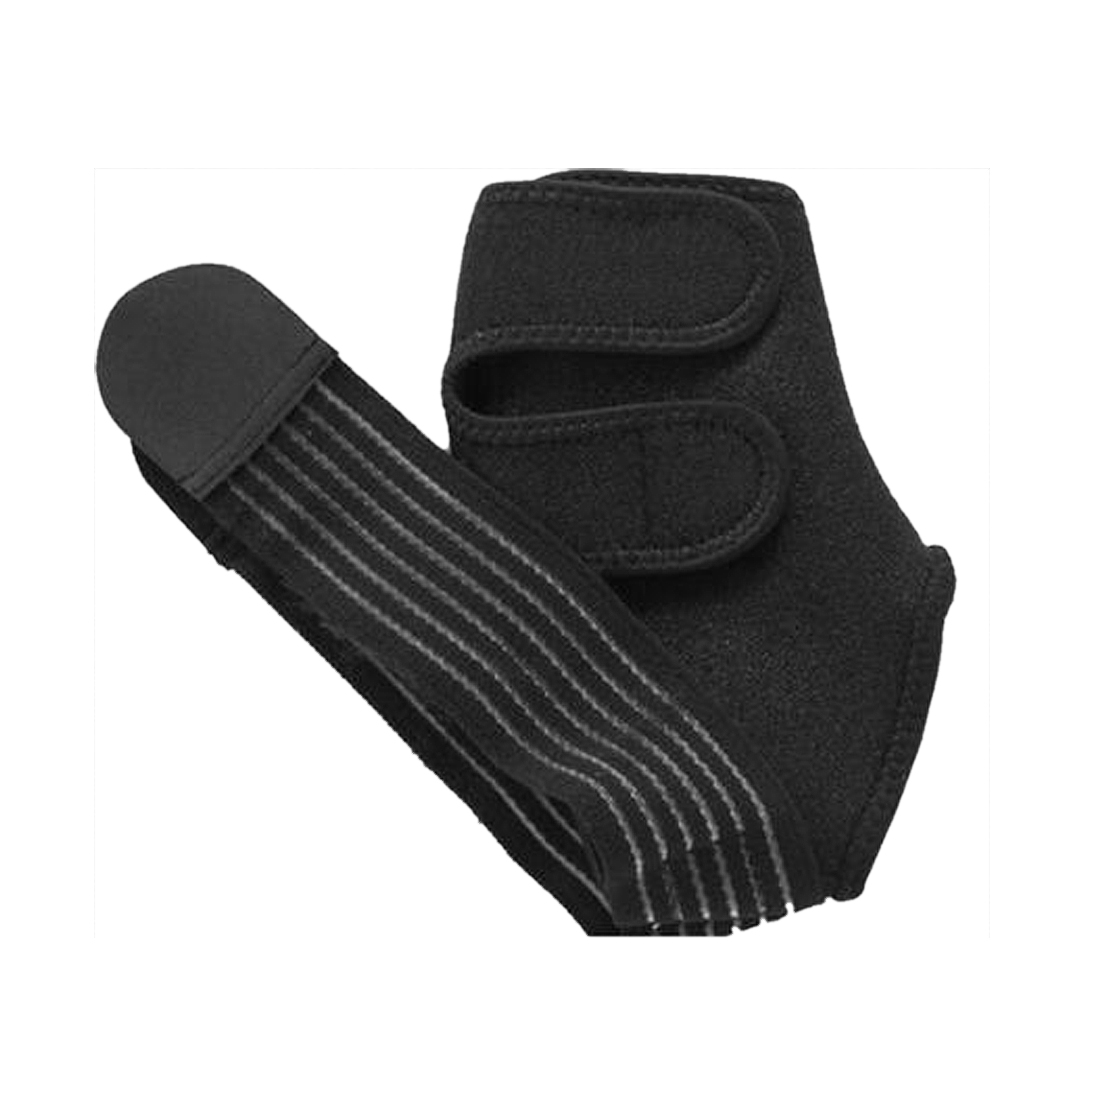 Unisex Adjustable Hook Loop Fastener Outdoor Gym Sports Ankle Support Strap Wrap Brace Guard Black